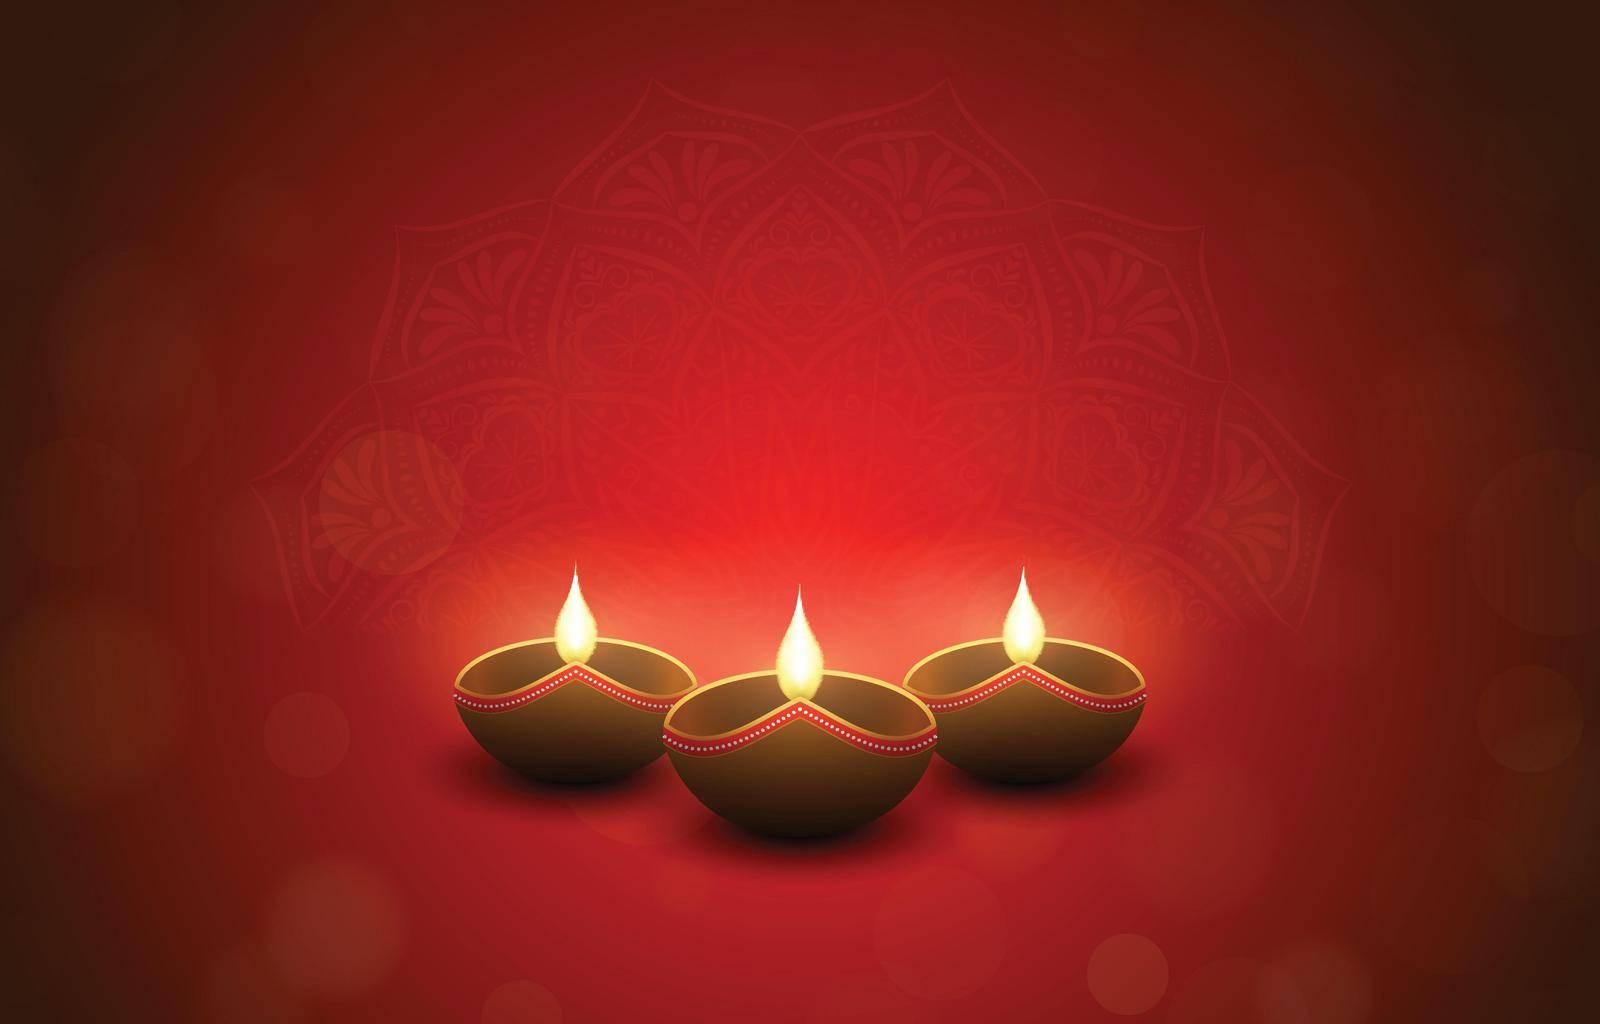 Red hindu festival design with burning diya lamps, bokeh and mandala effect. Diwali and Tihar holiday concept. Vector illustration.